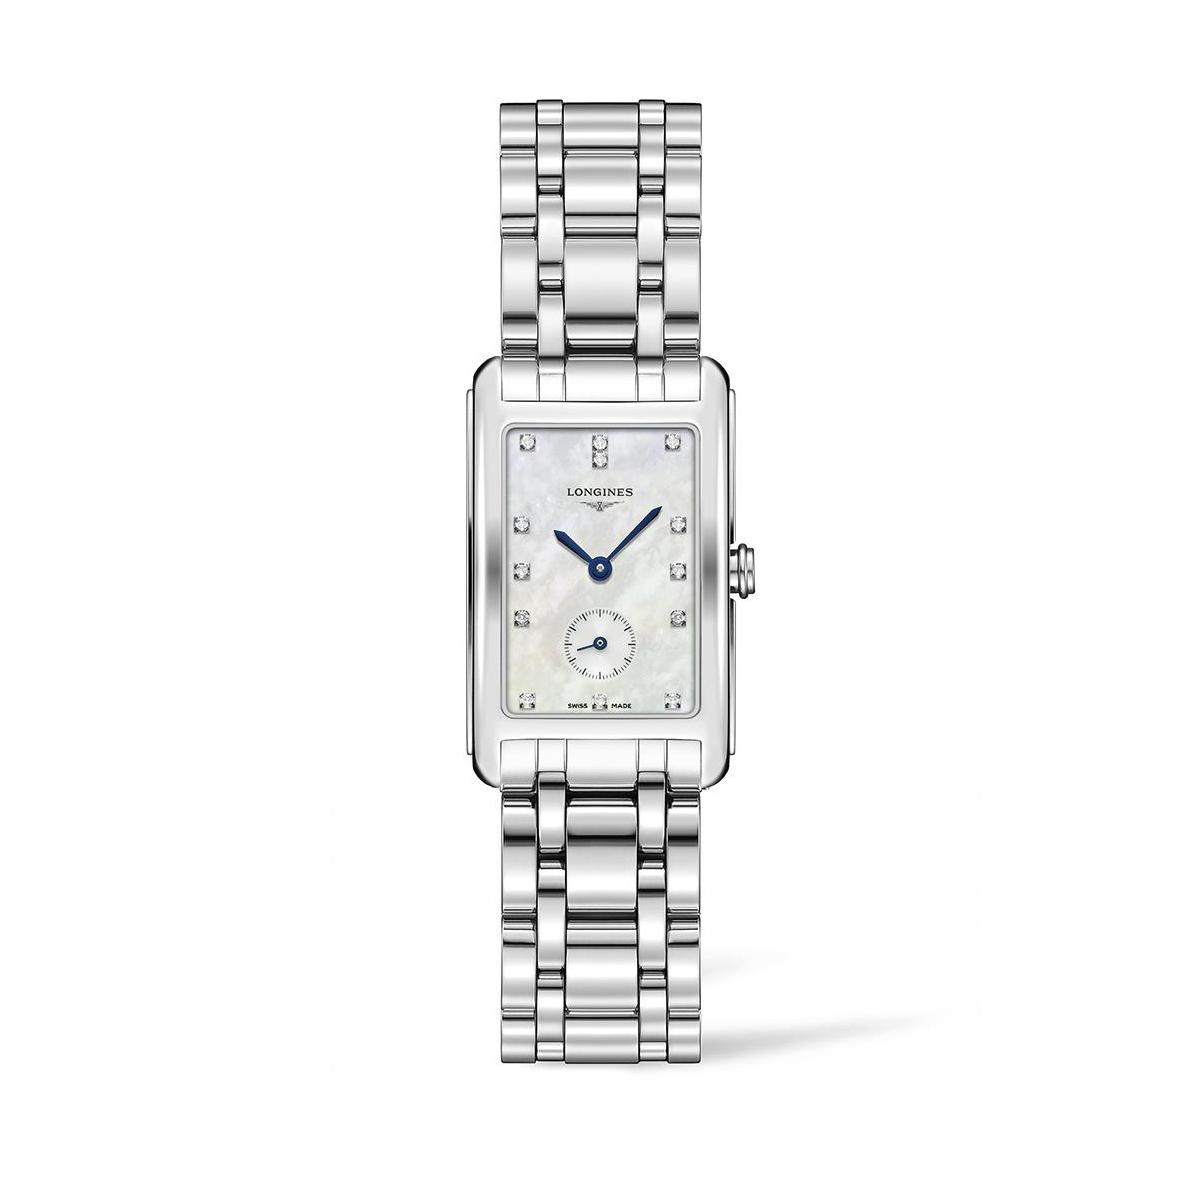 Longines Stainless Steel 23.3X37mm DolceVita Quartz Watch (L55124876)